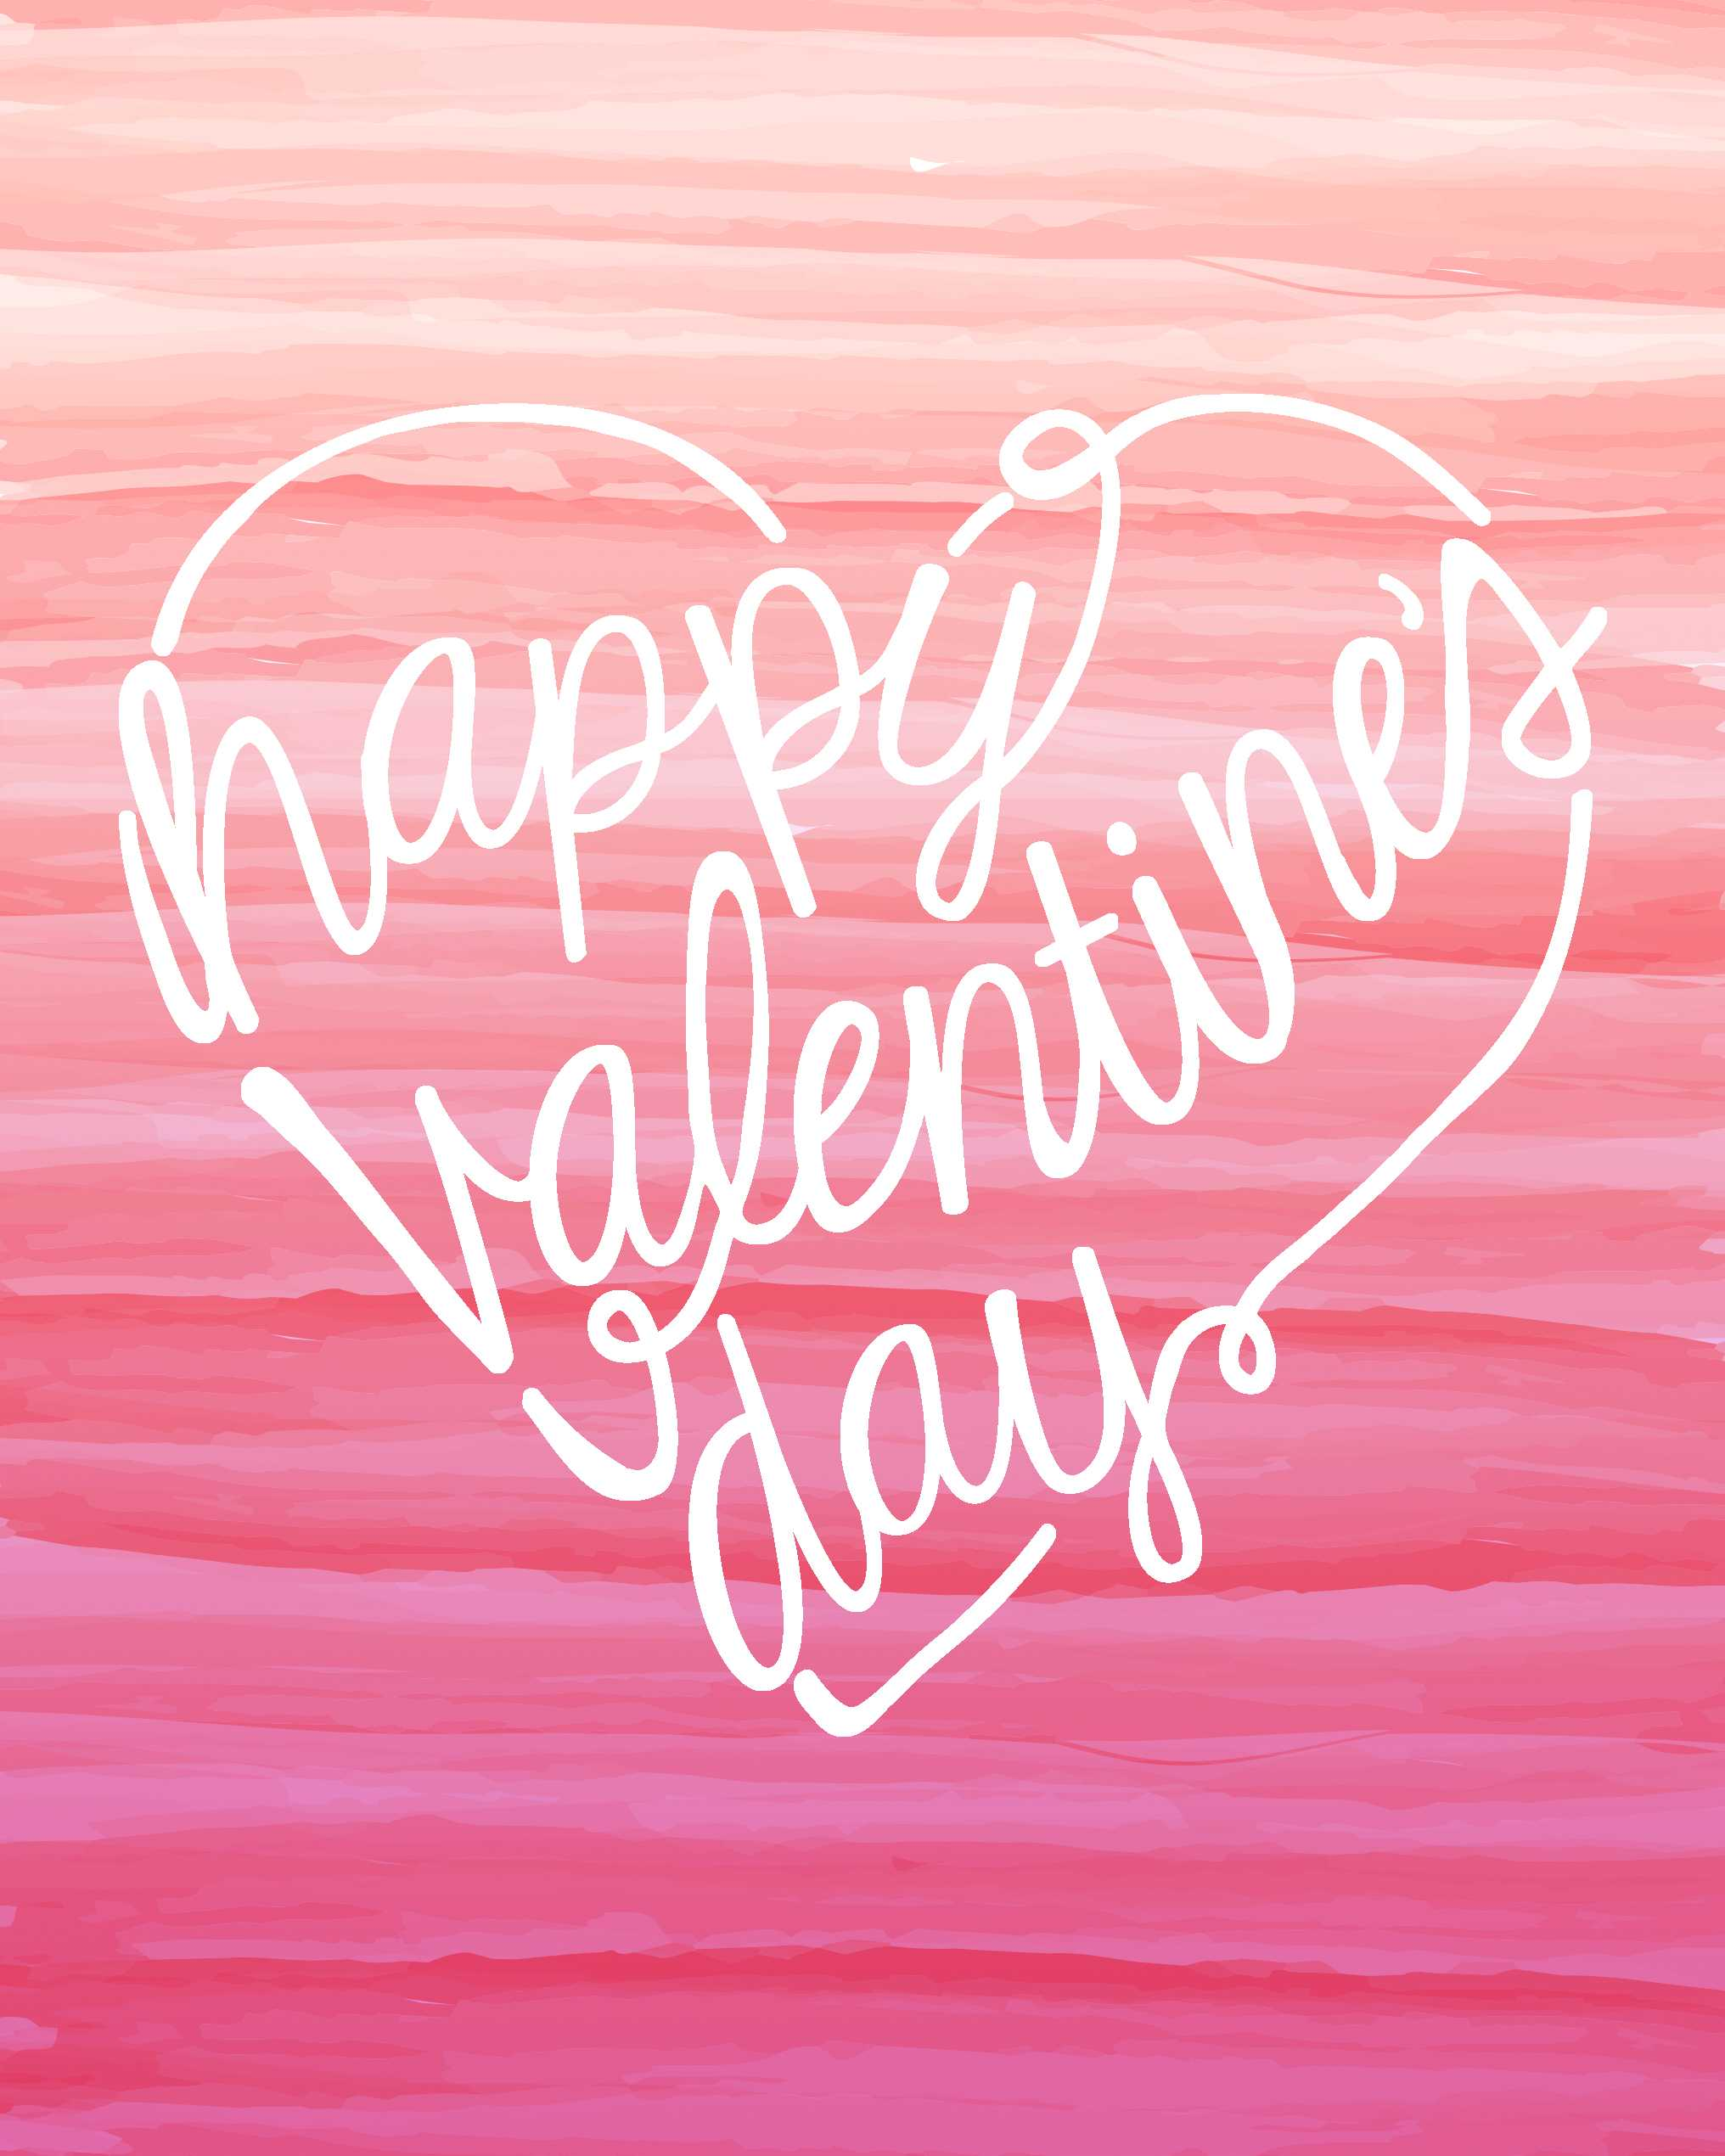 happy-valentines-day-watercolor-free-printable_aca175bc-d541-4816-833f-edc8d03db7de